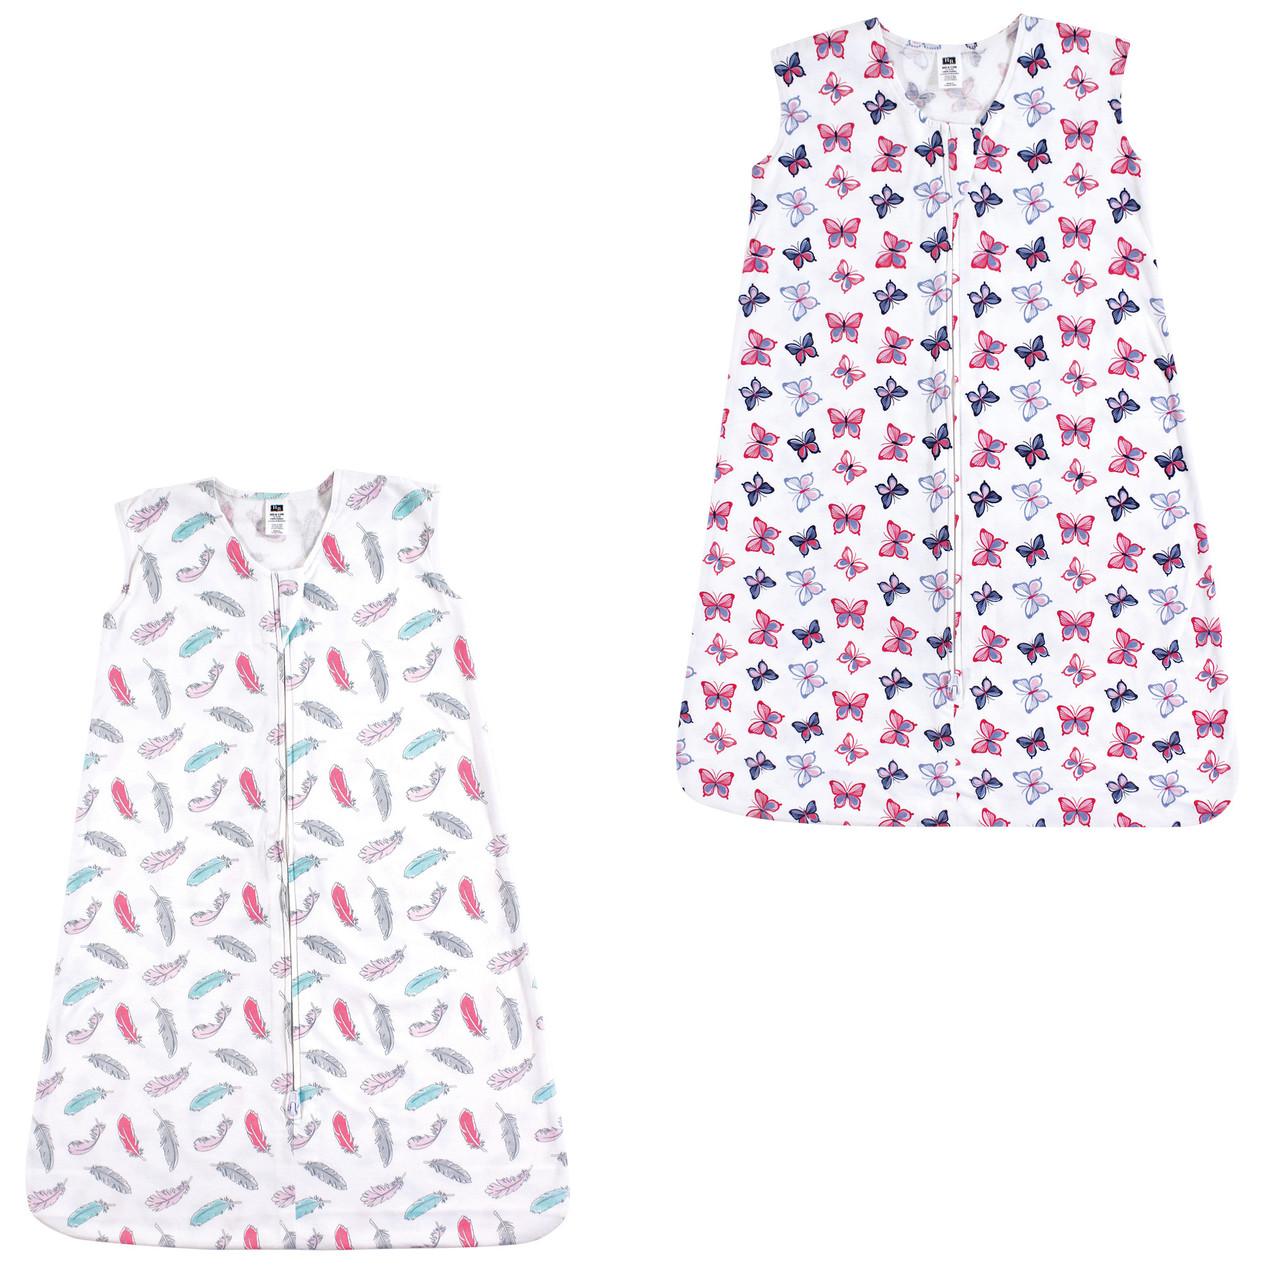 Hudson Baby Boy and Girl Safe Sleep Wearable Jersey Sleeping Bag//Blanket Midnig